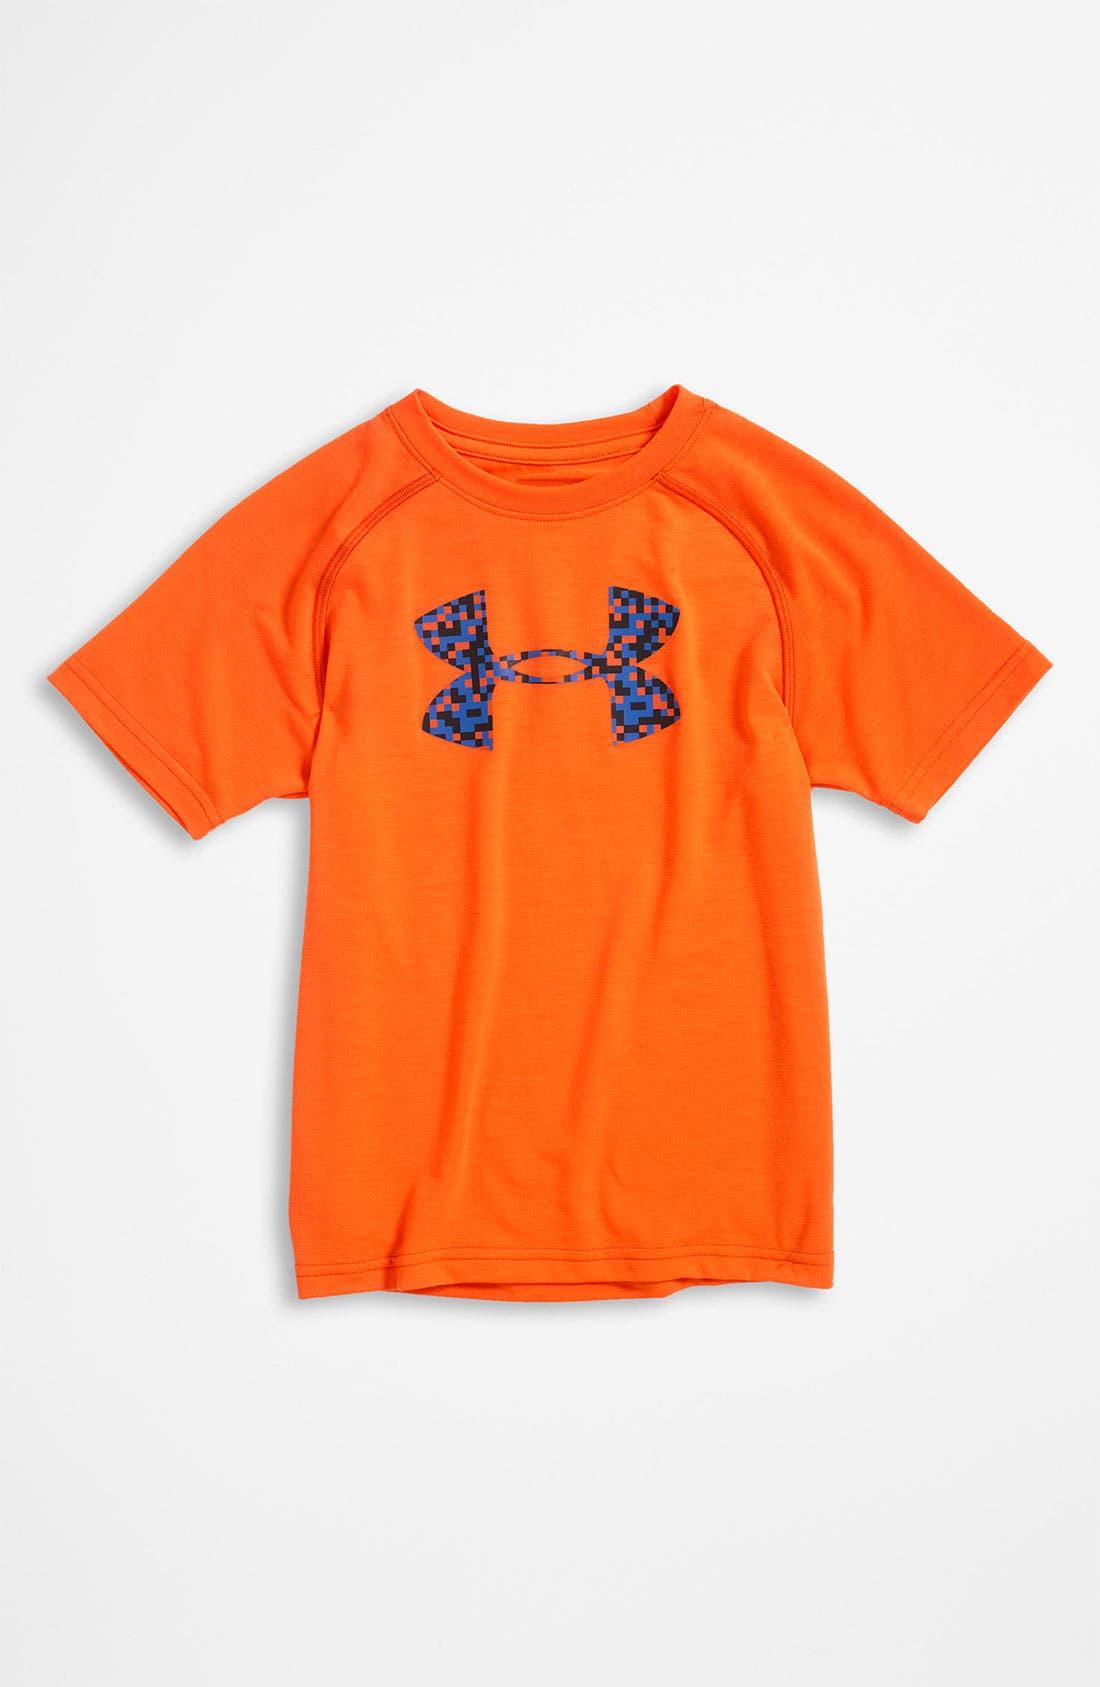 Alternate Image 1 Selected - Under Armour 'Big Logo Tech' T-Shirt (Little Boys)